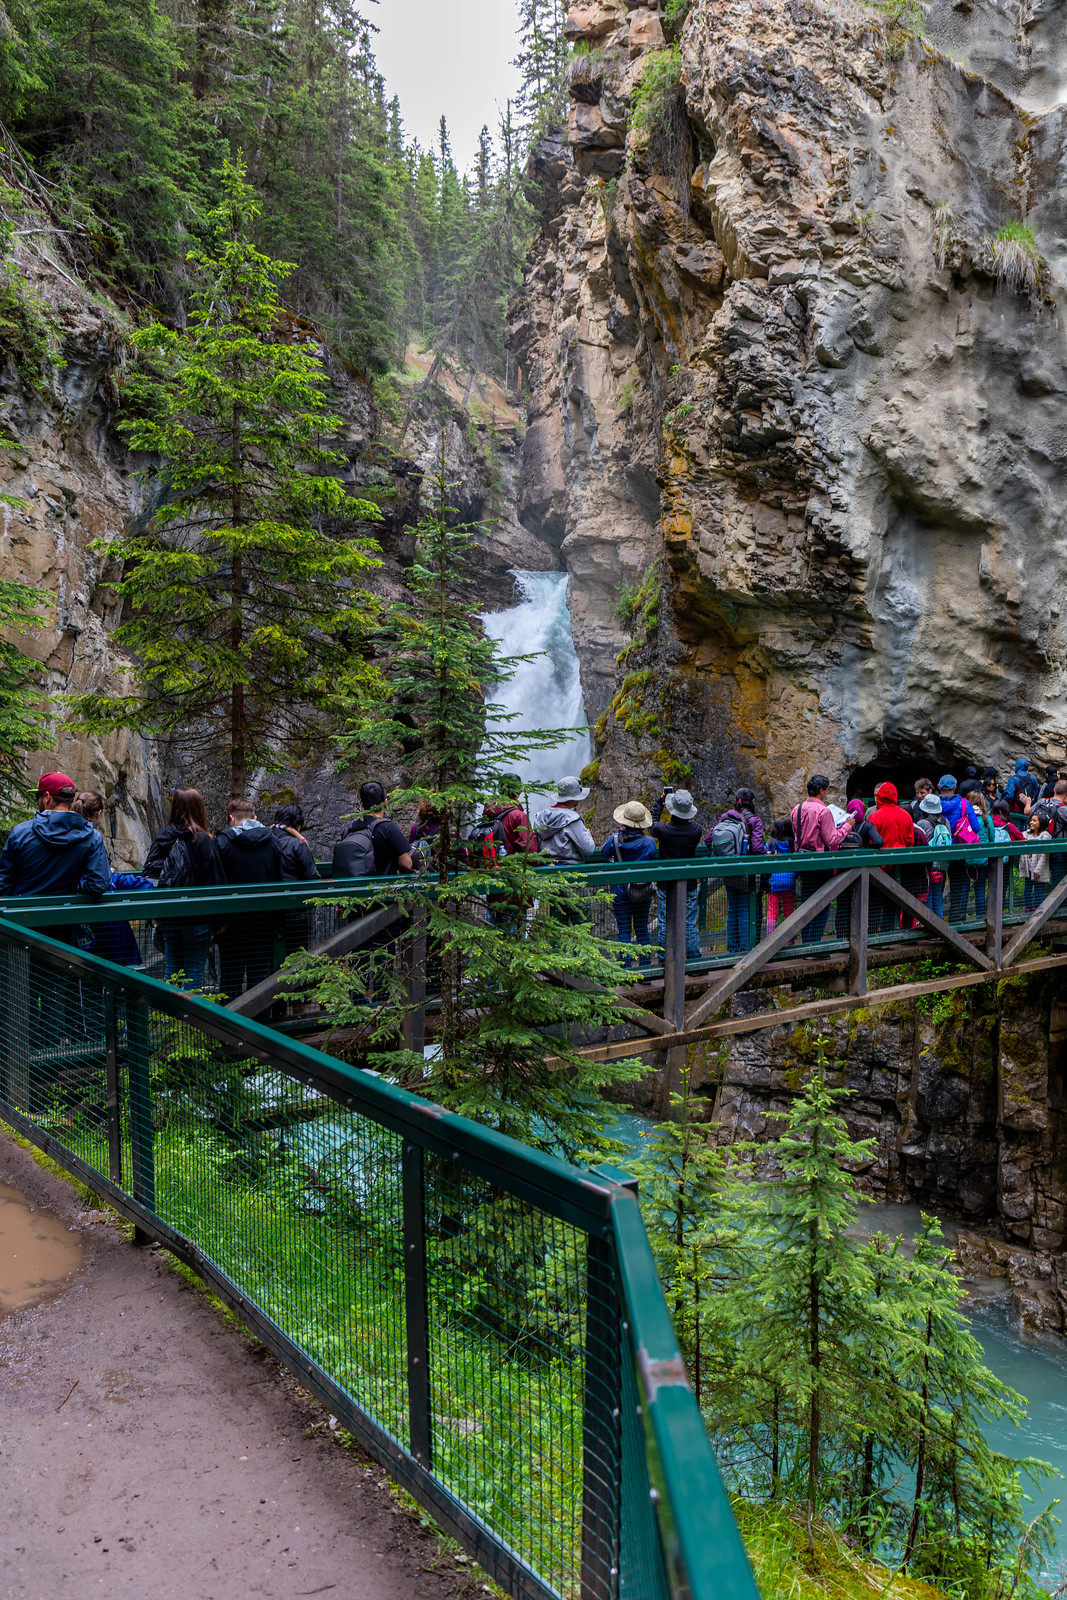 06.29. Johnston Canyon, Banff National Park, AB, Canada